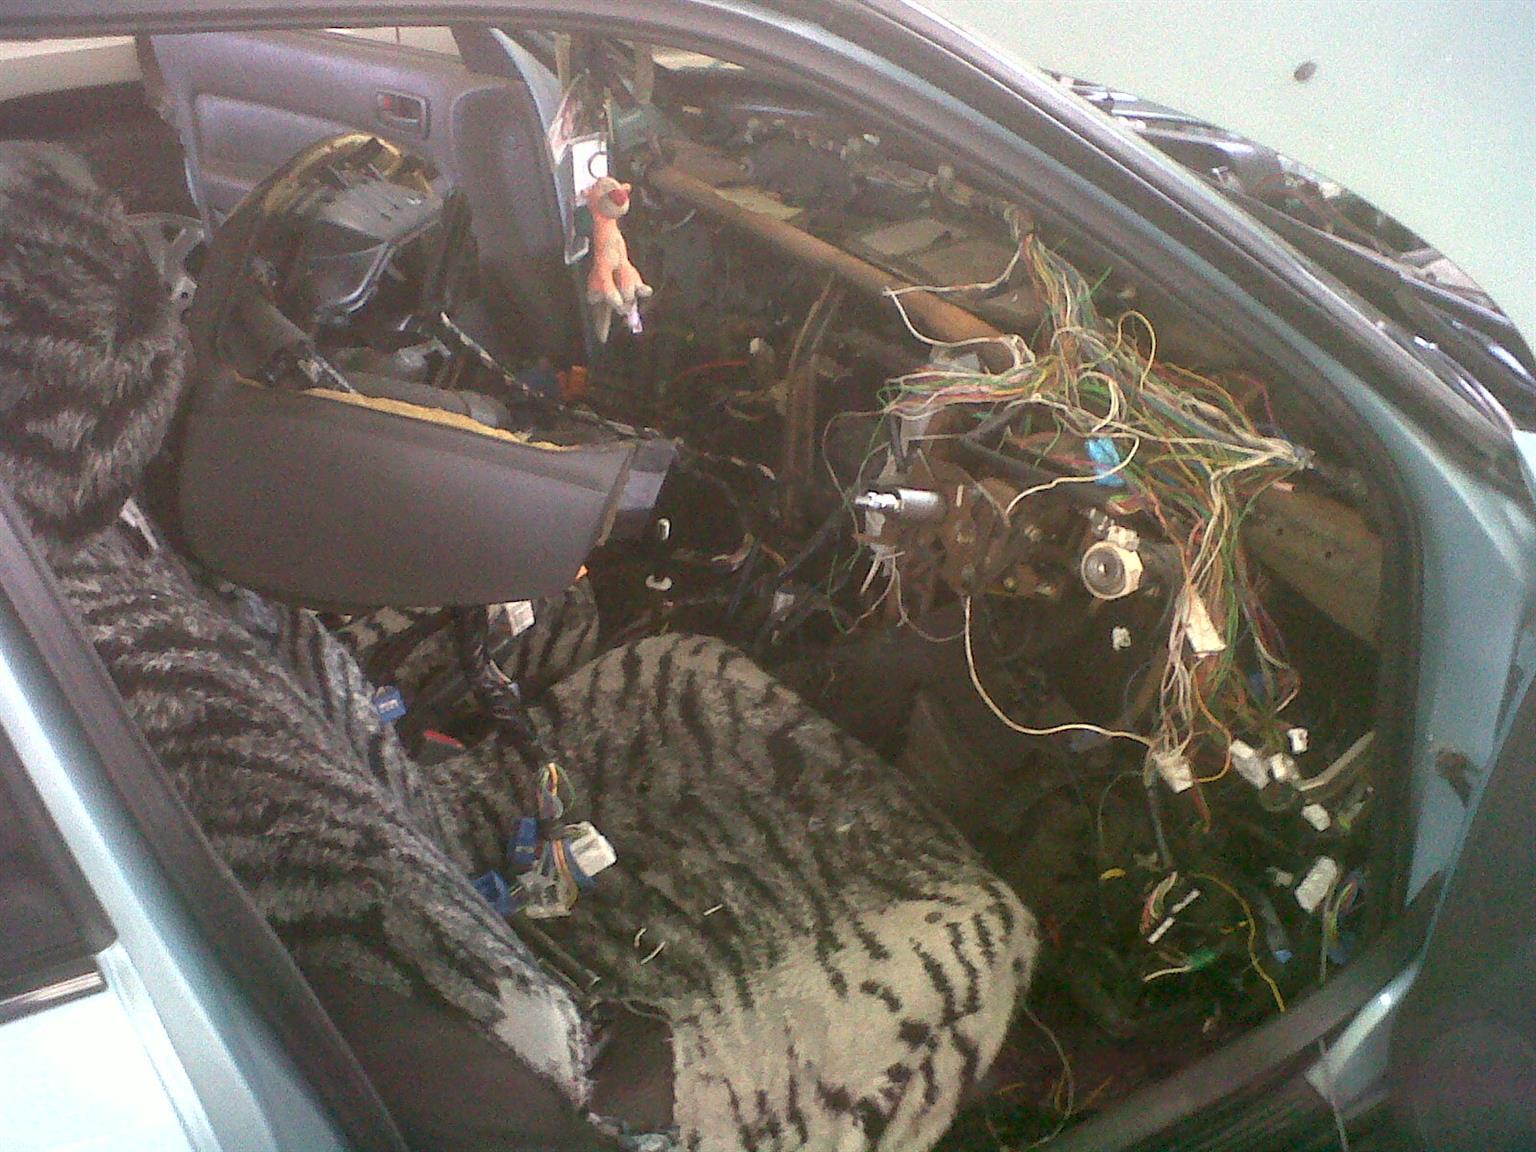 ALPINE AUTO ELECTRIC AND MECHANICAL / WILLARD XPRESS